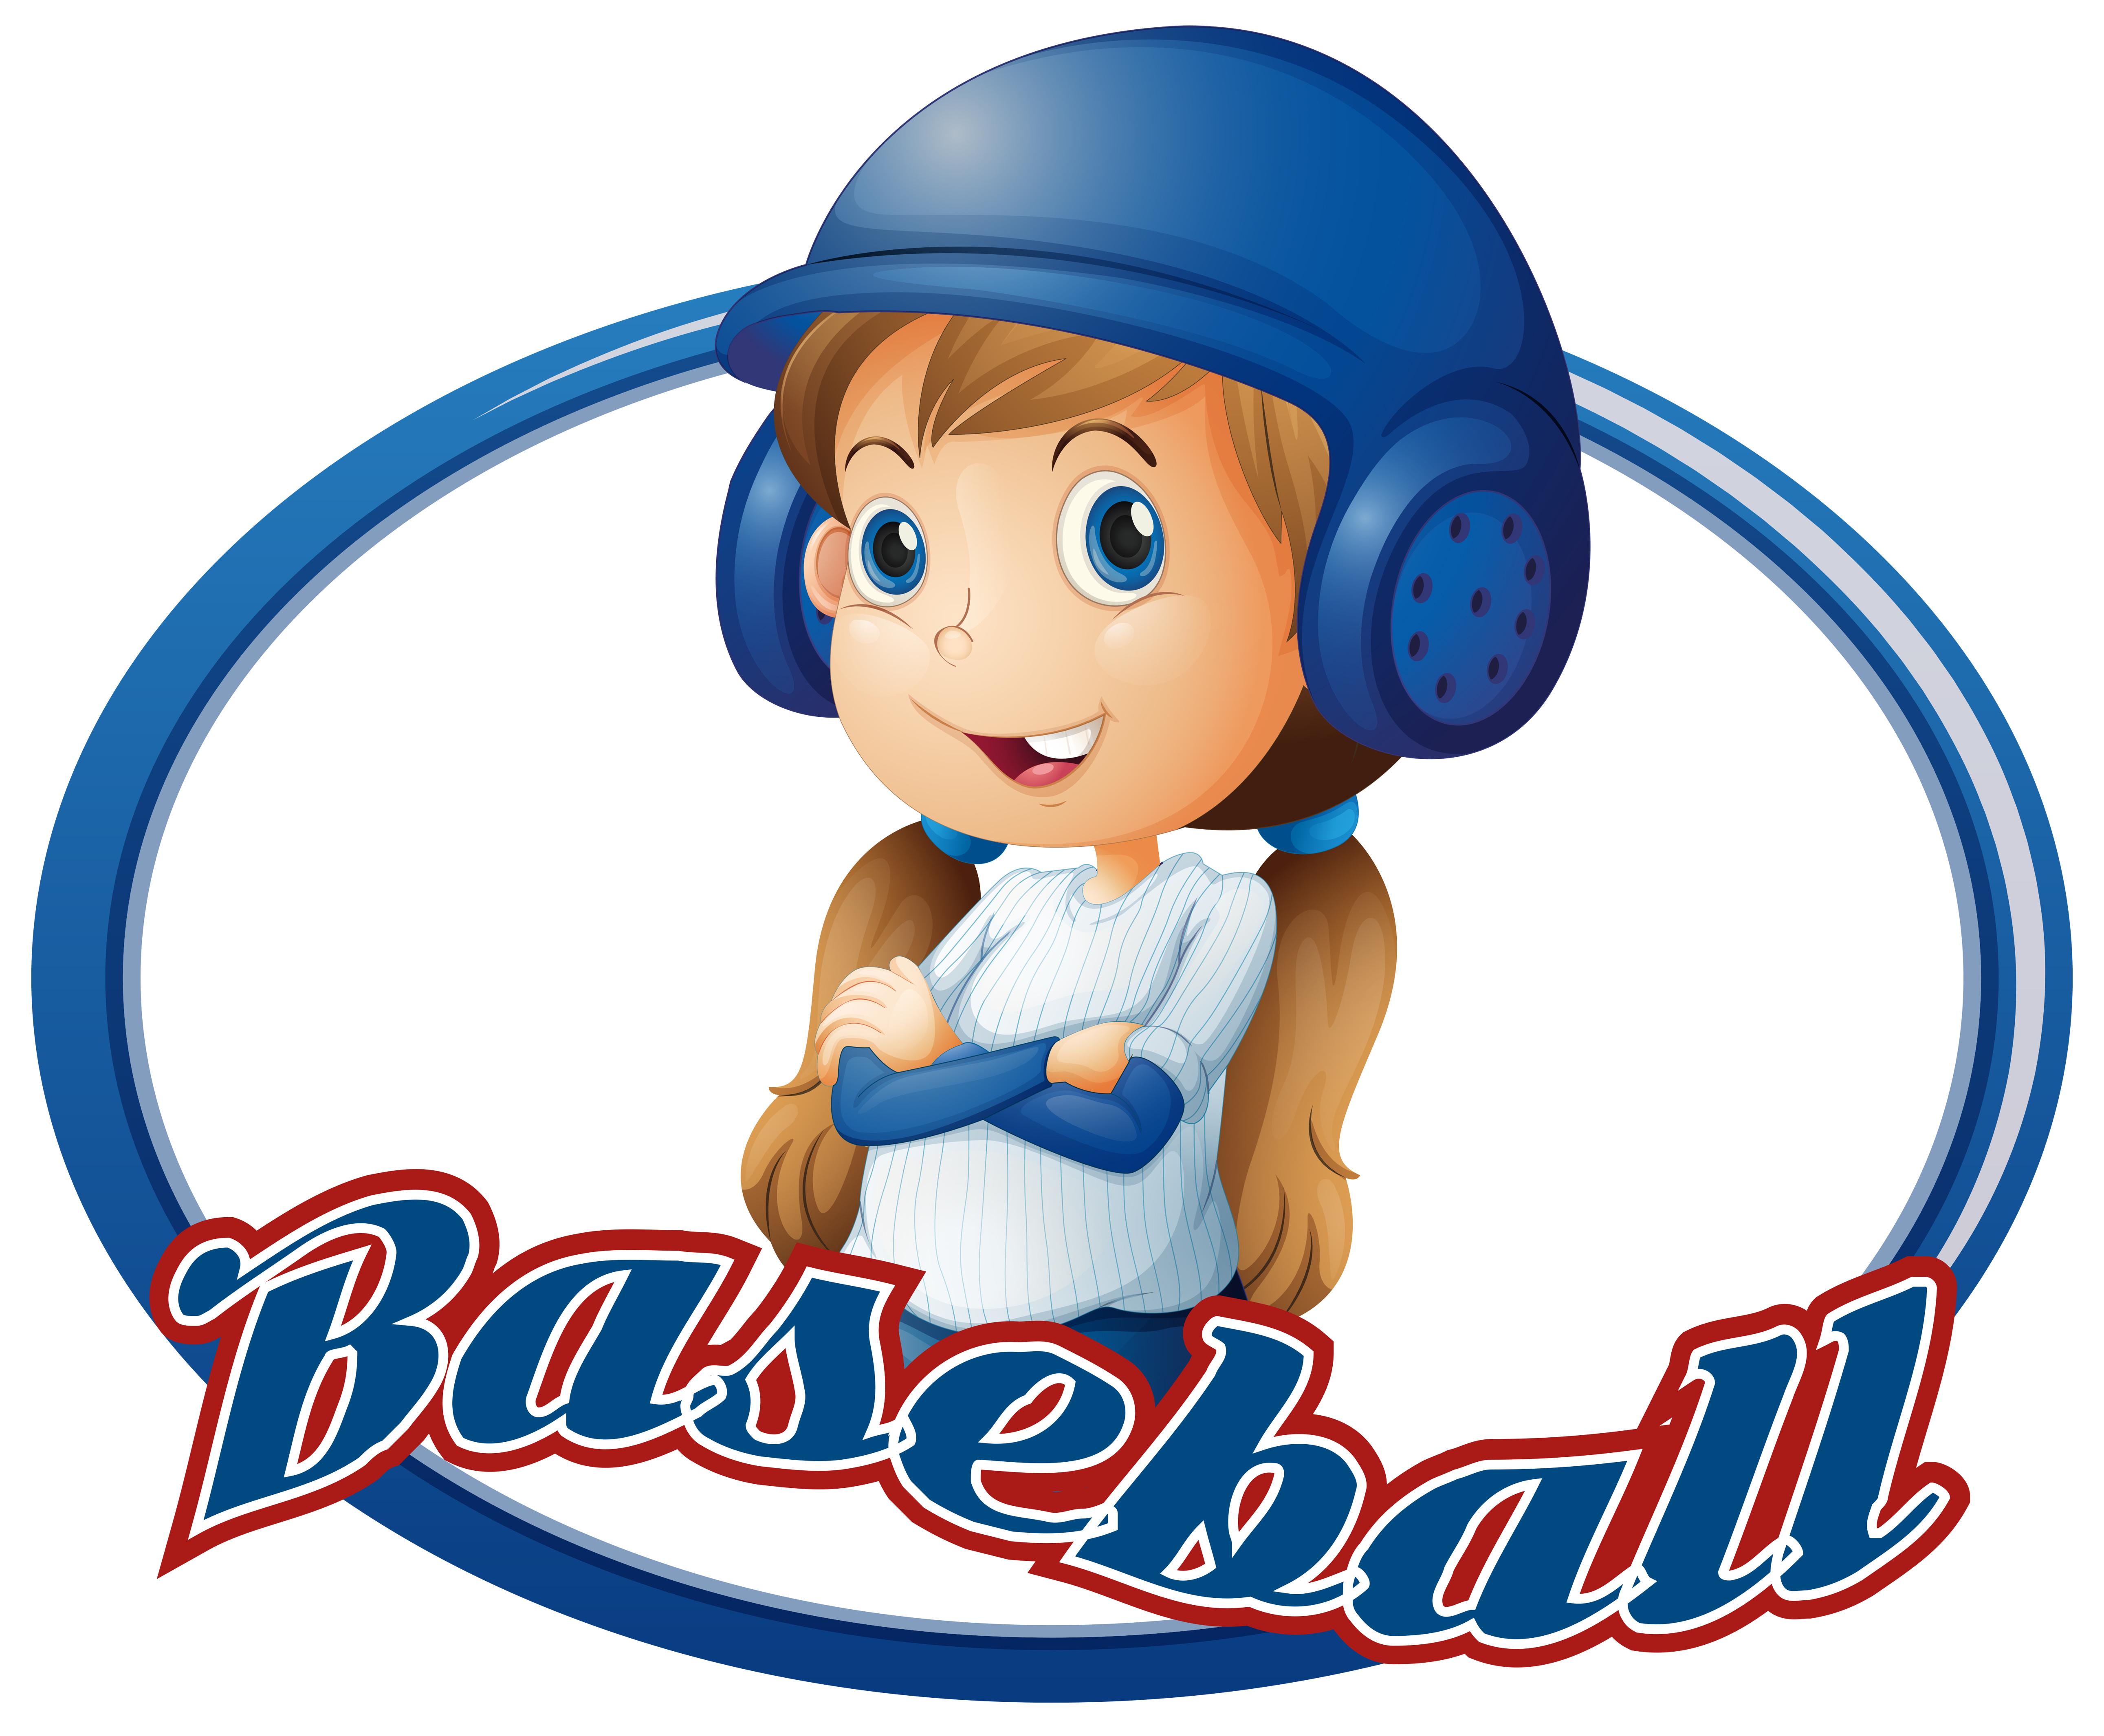 Little girl in baseball outfit